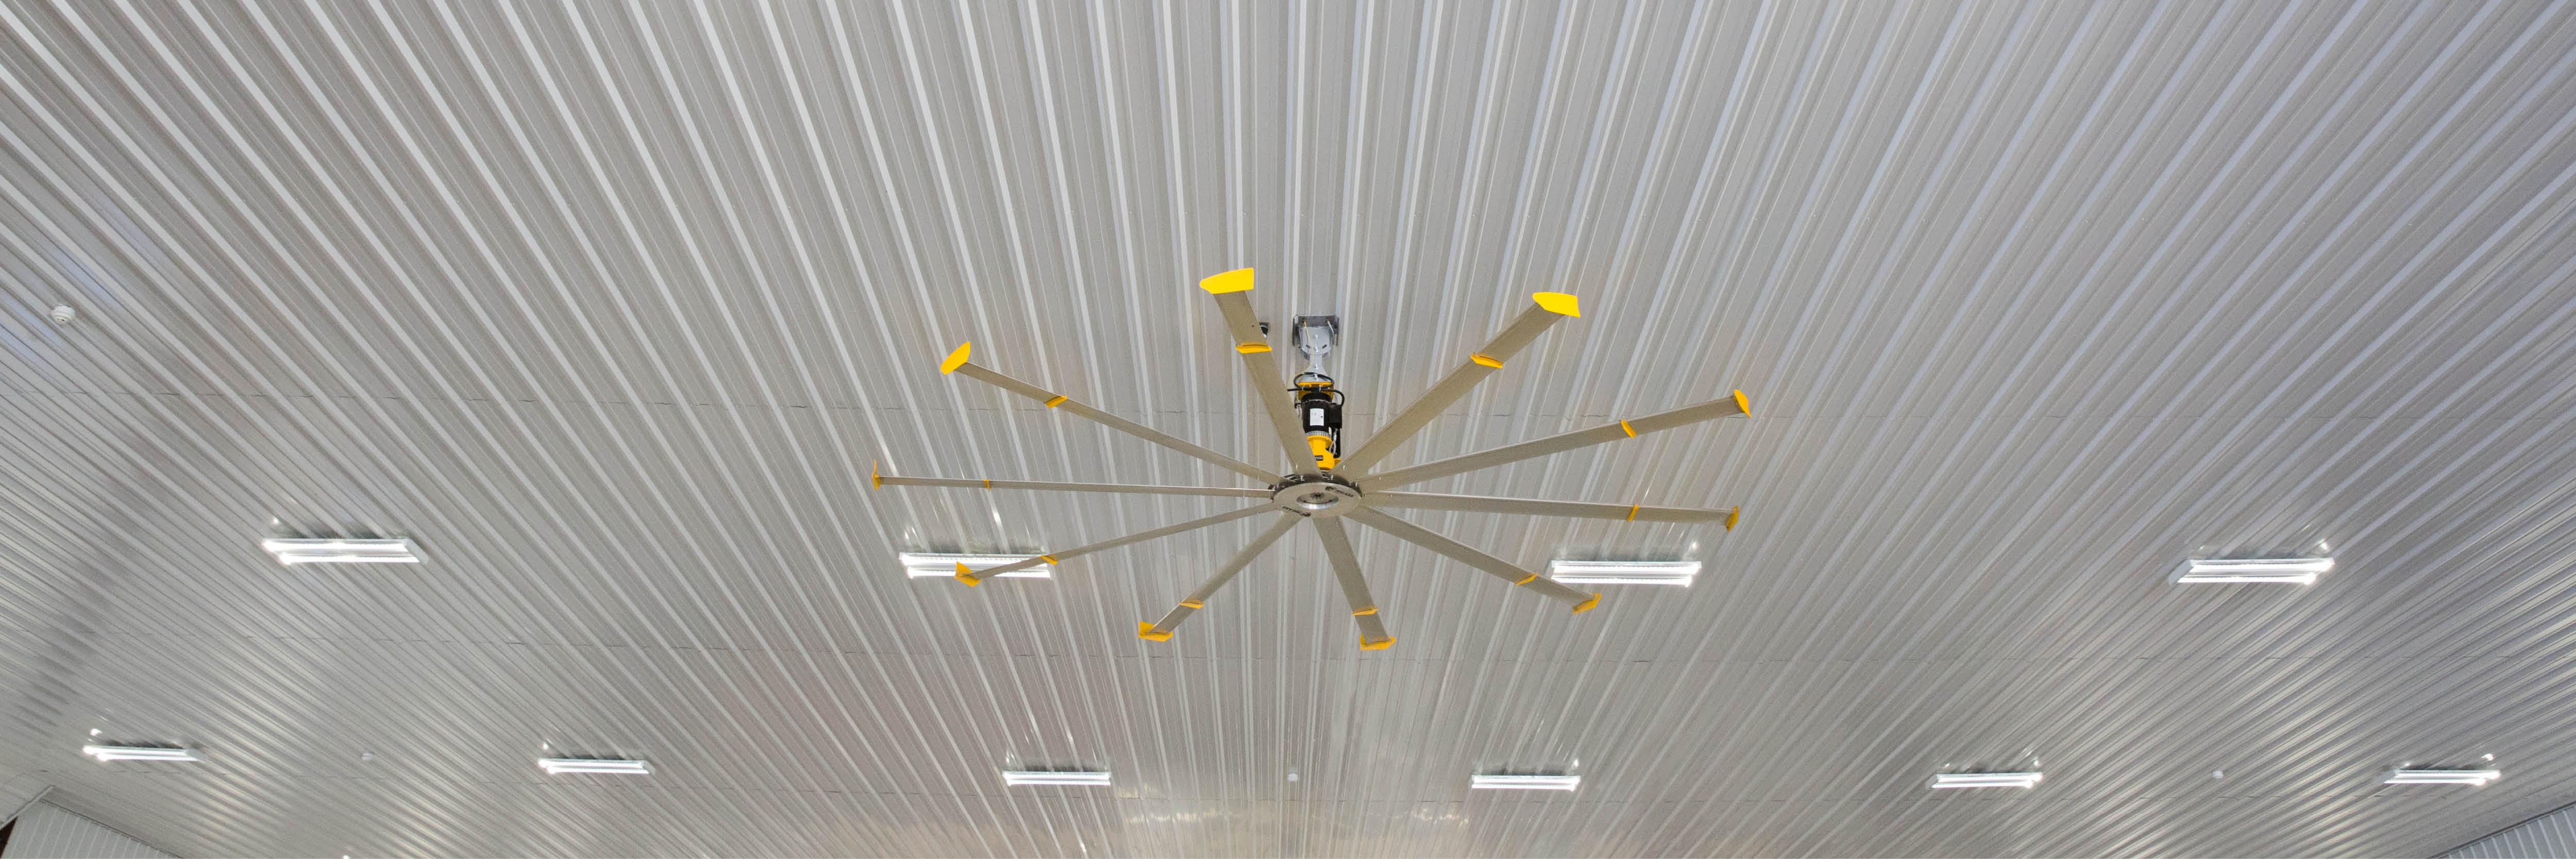 Top Pole Barn Fan Companies: 4 Installation Advantages